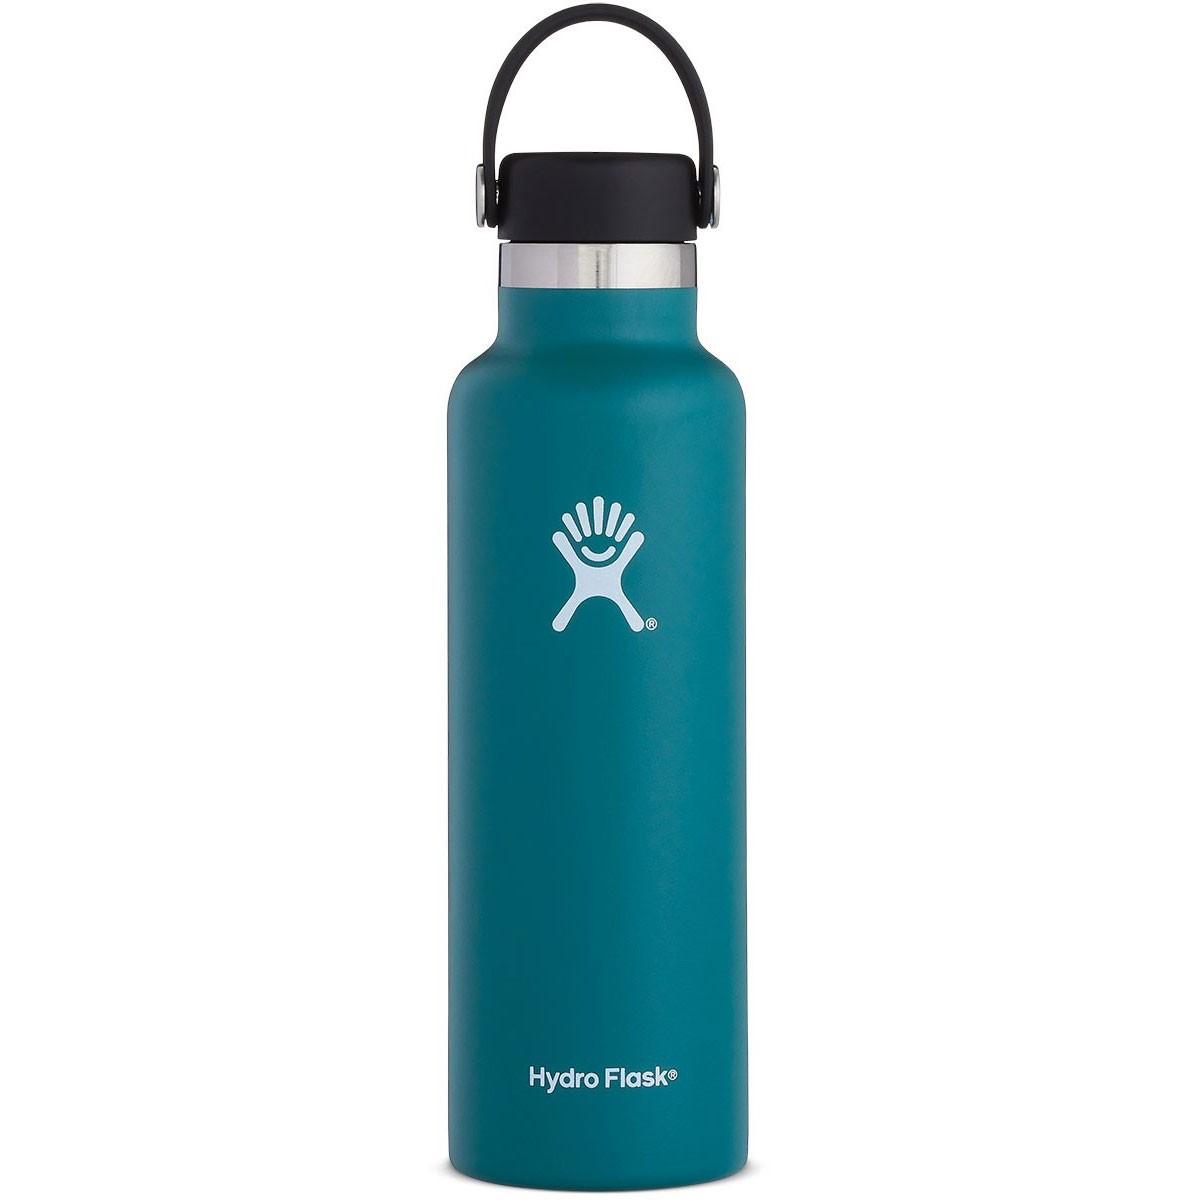 HYDRO FLASK - 21oz Insulated Bottle - Jade